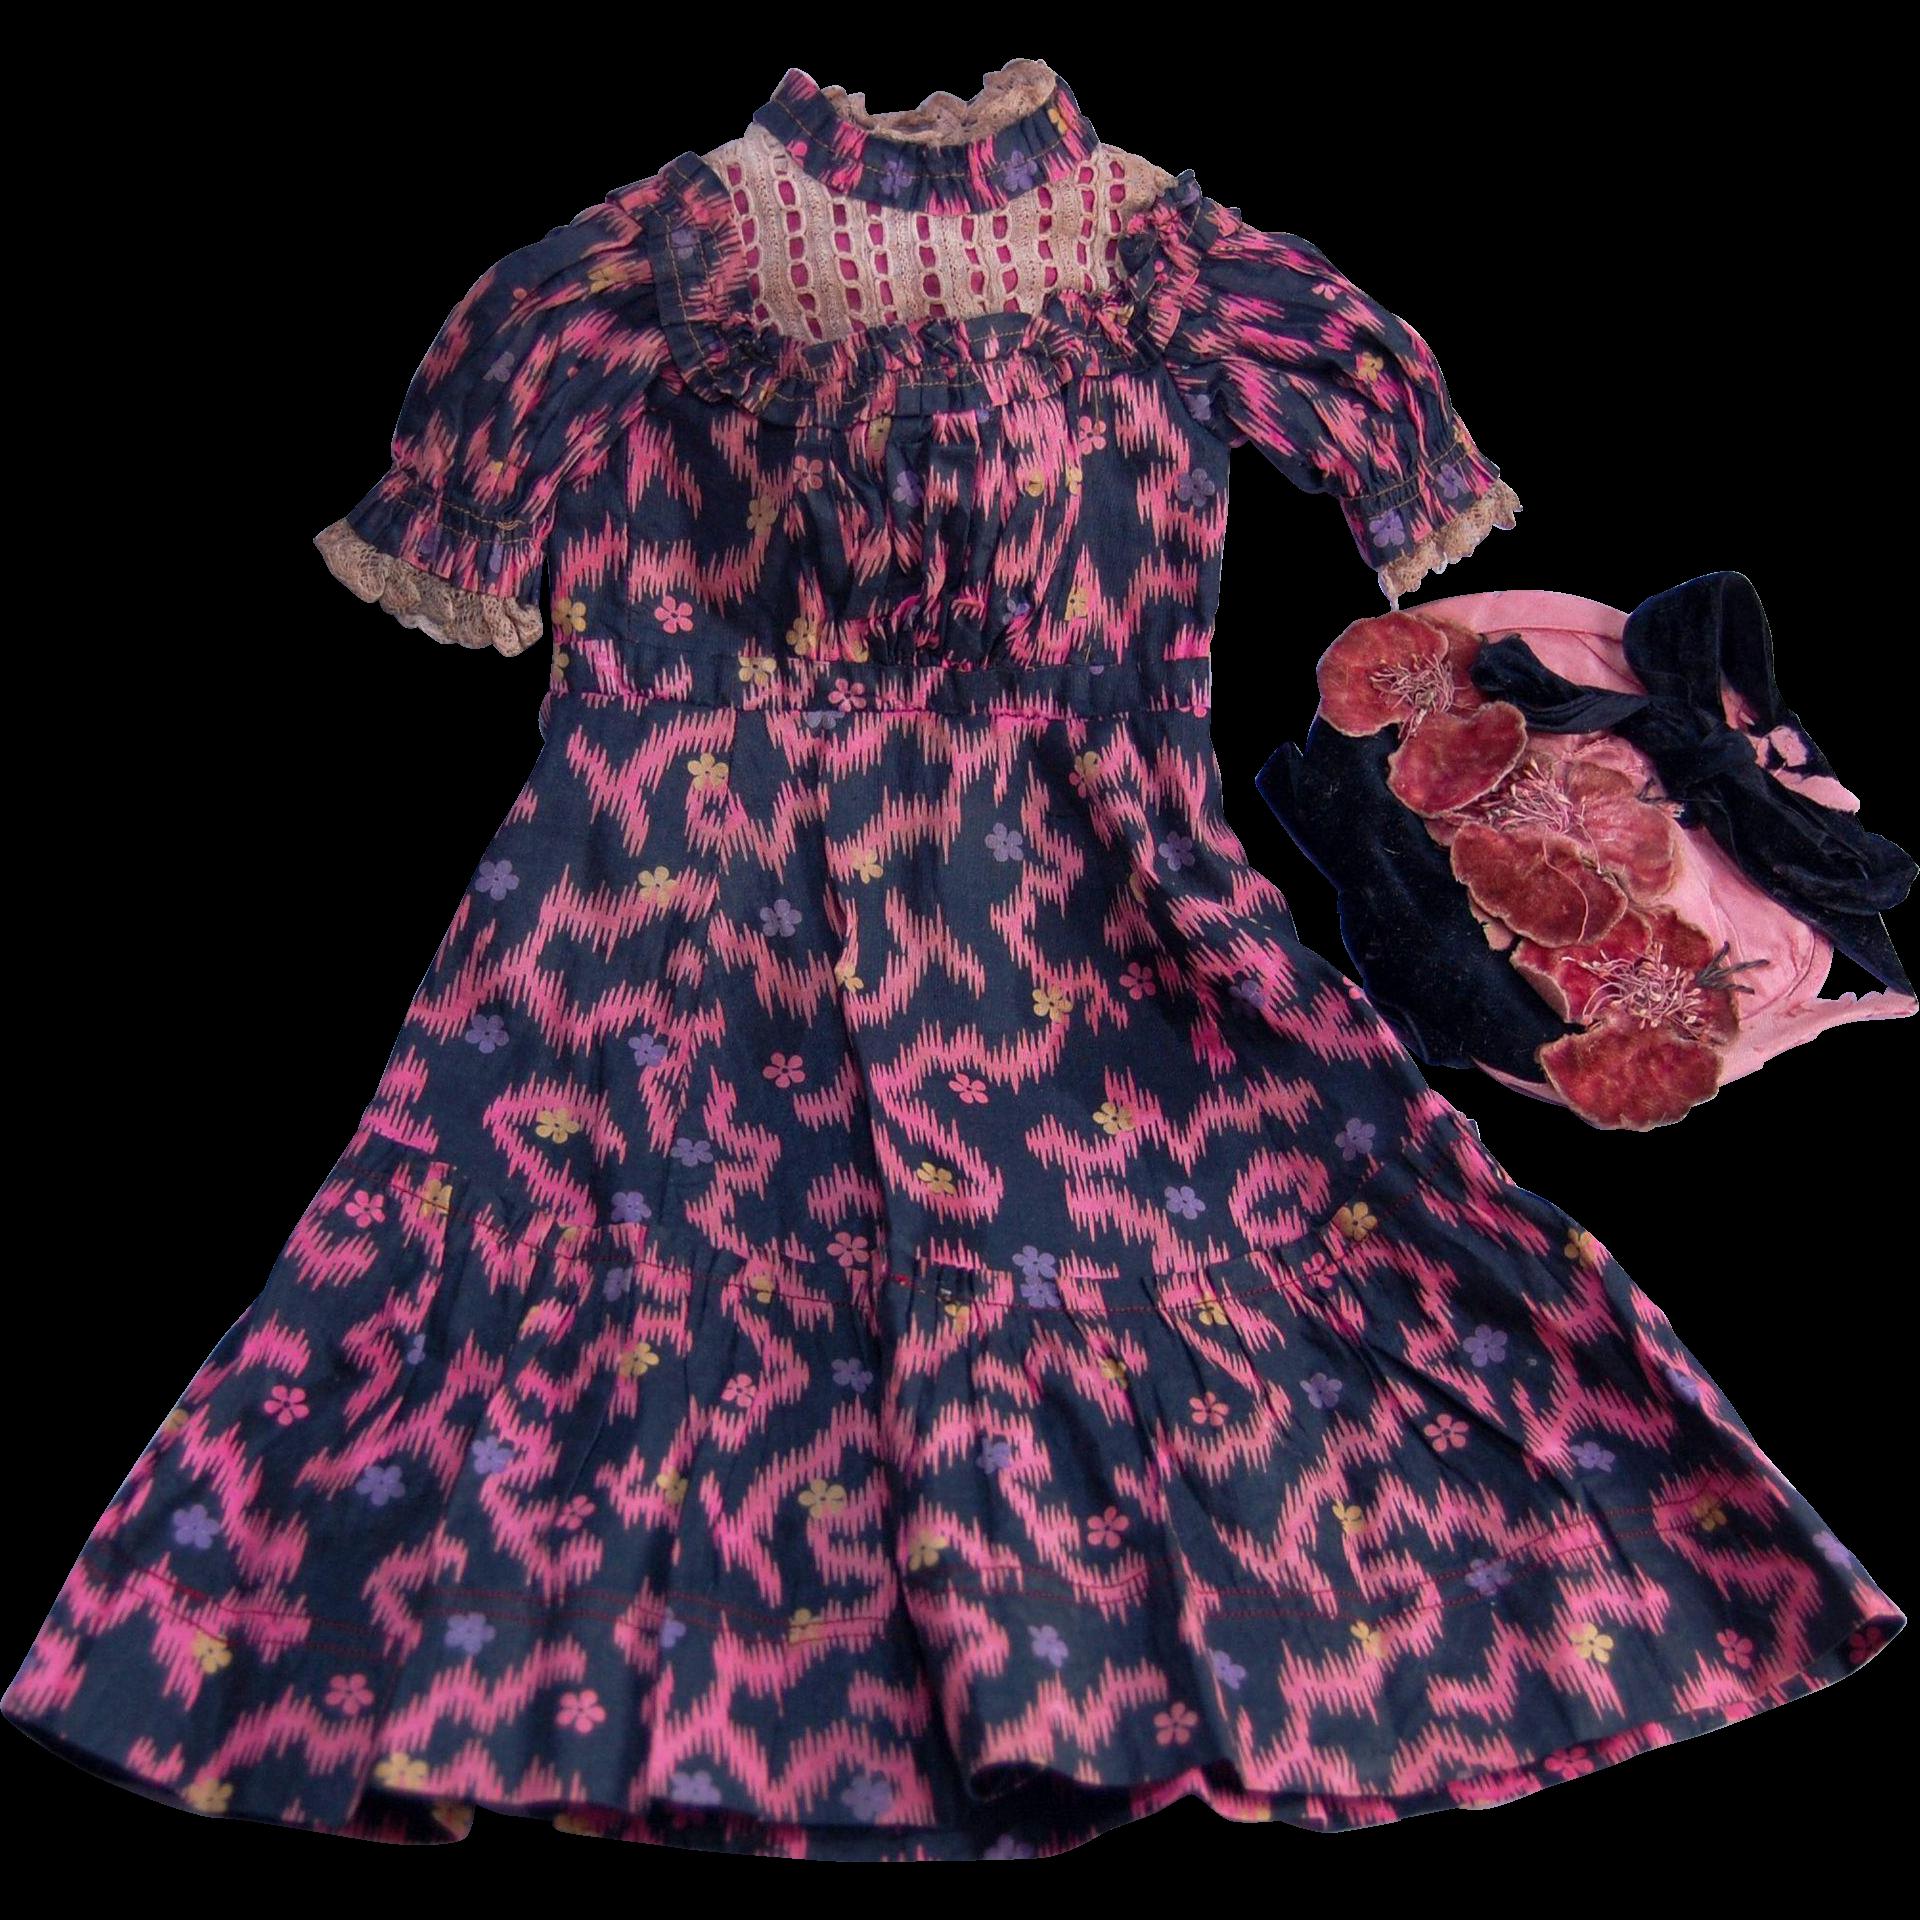 Antique doll dress and bonnet for shoulderhead china bisque papier mache dolls  pink and florals on black material TLC